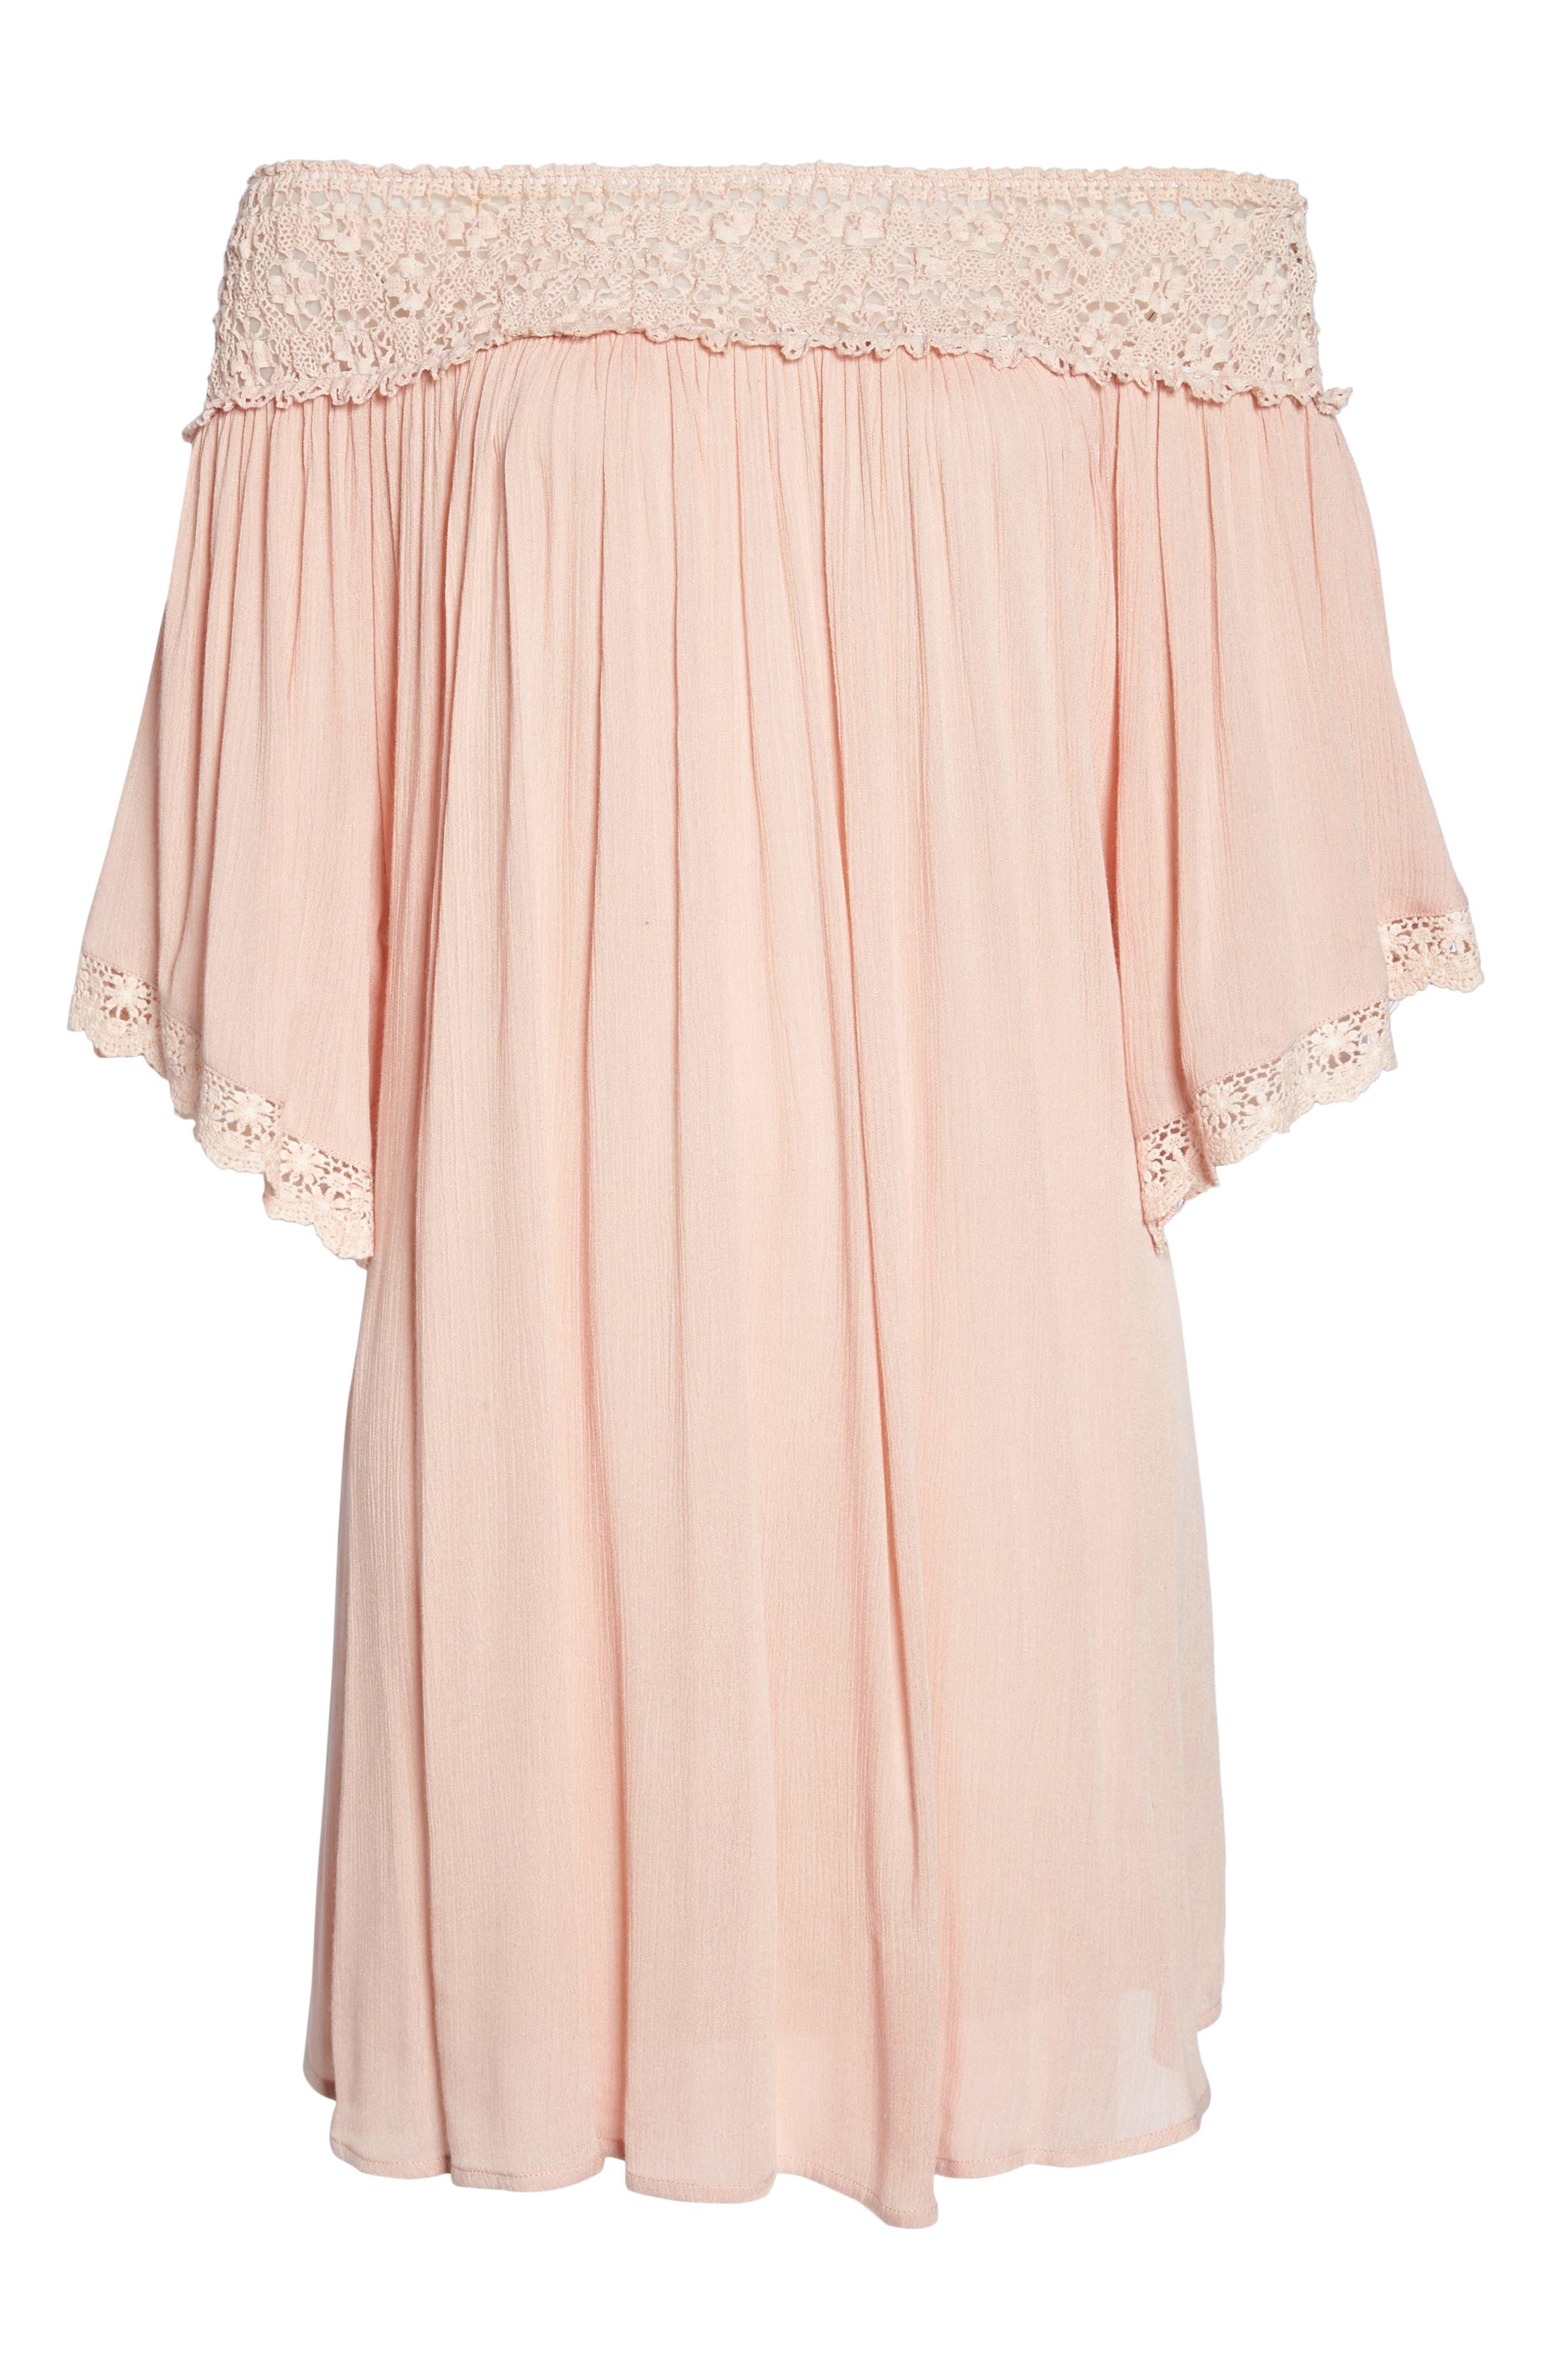 Rimini Crochet Cover-Up Dress,                             Alternate thumbnail 12, color,